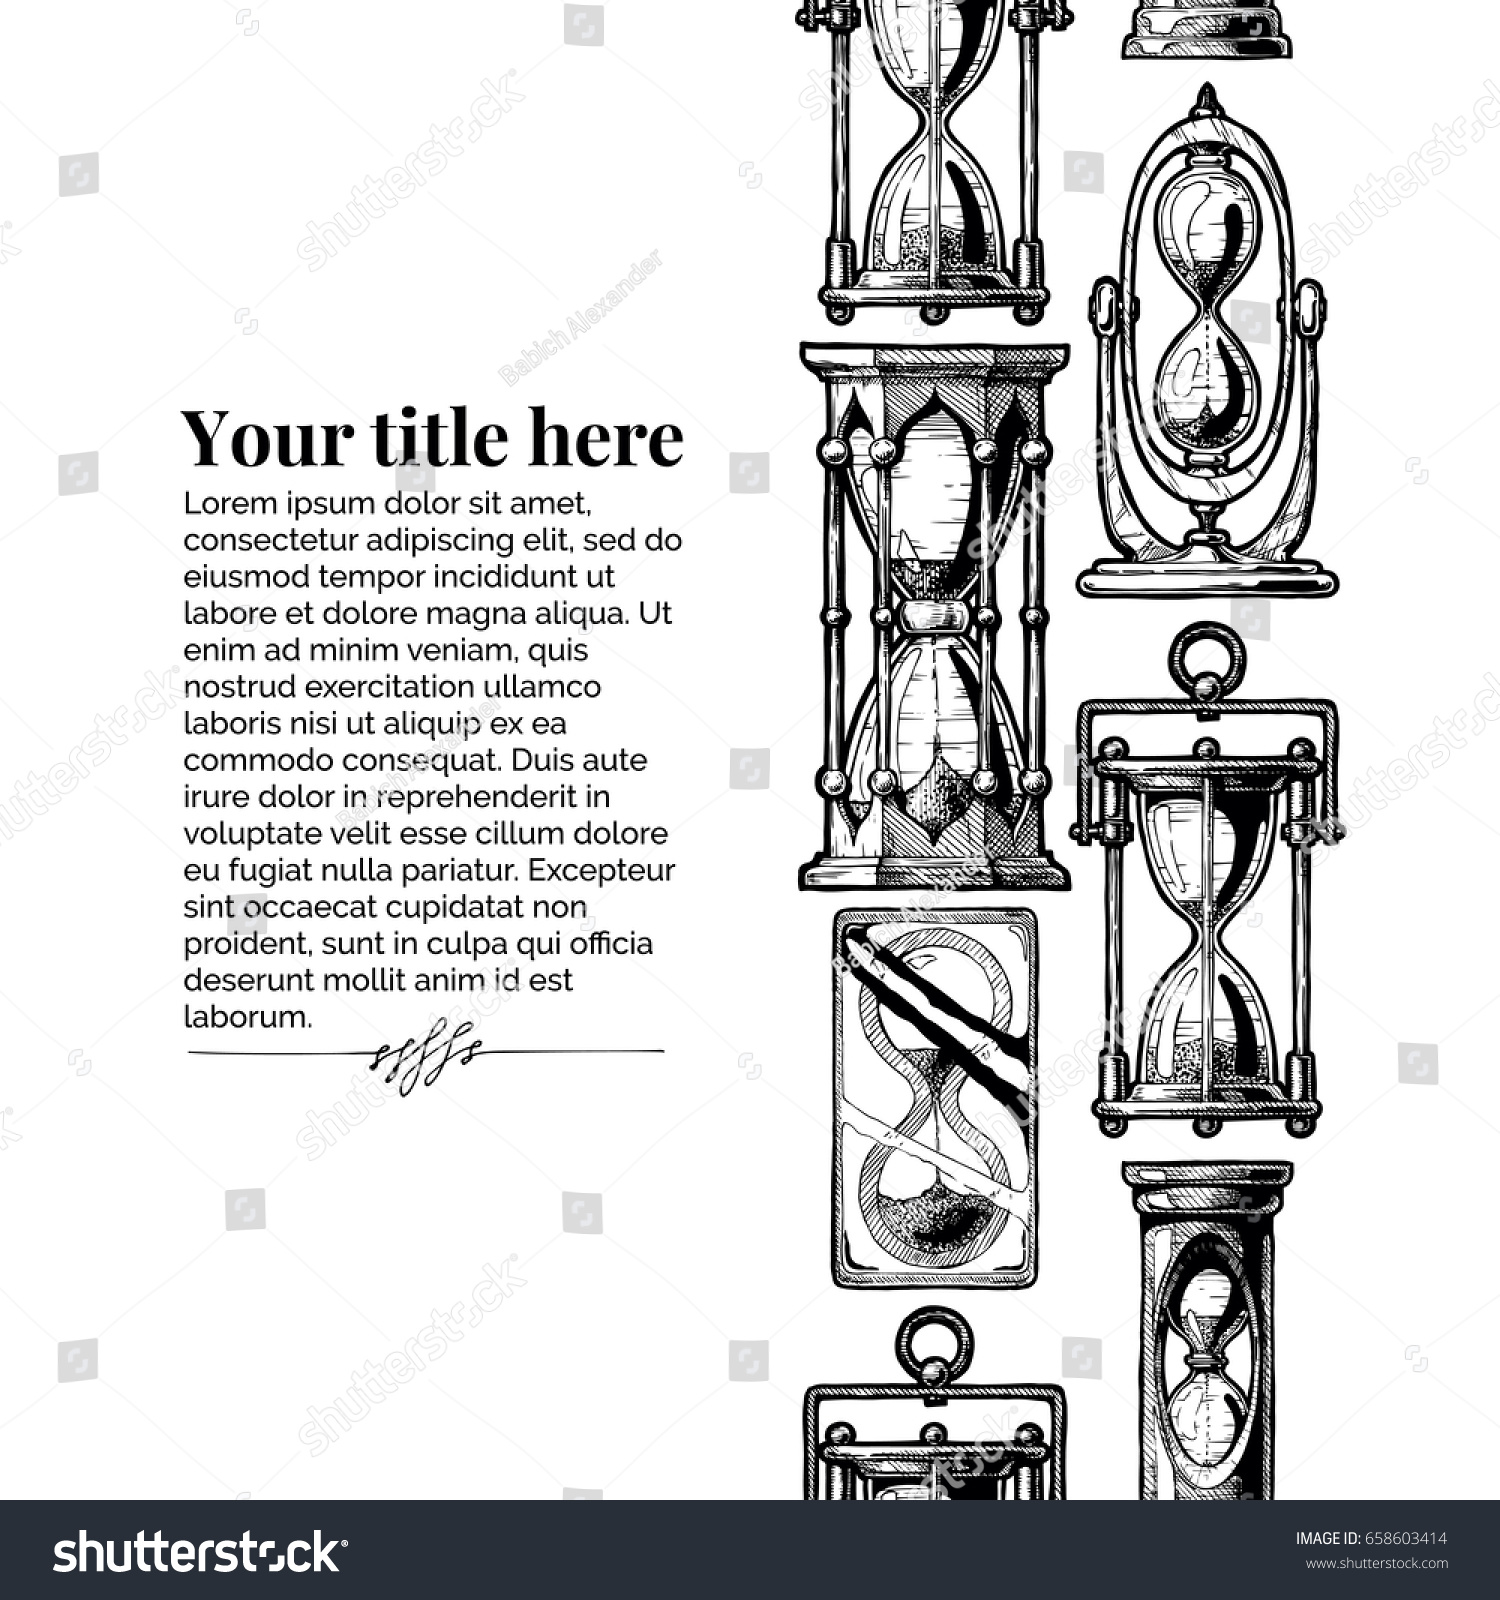 Wonderful Engraving Templates Contemporary Professional Resume - Engraving templates